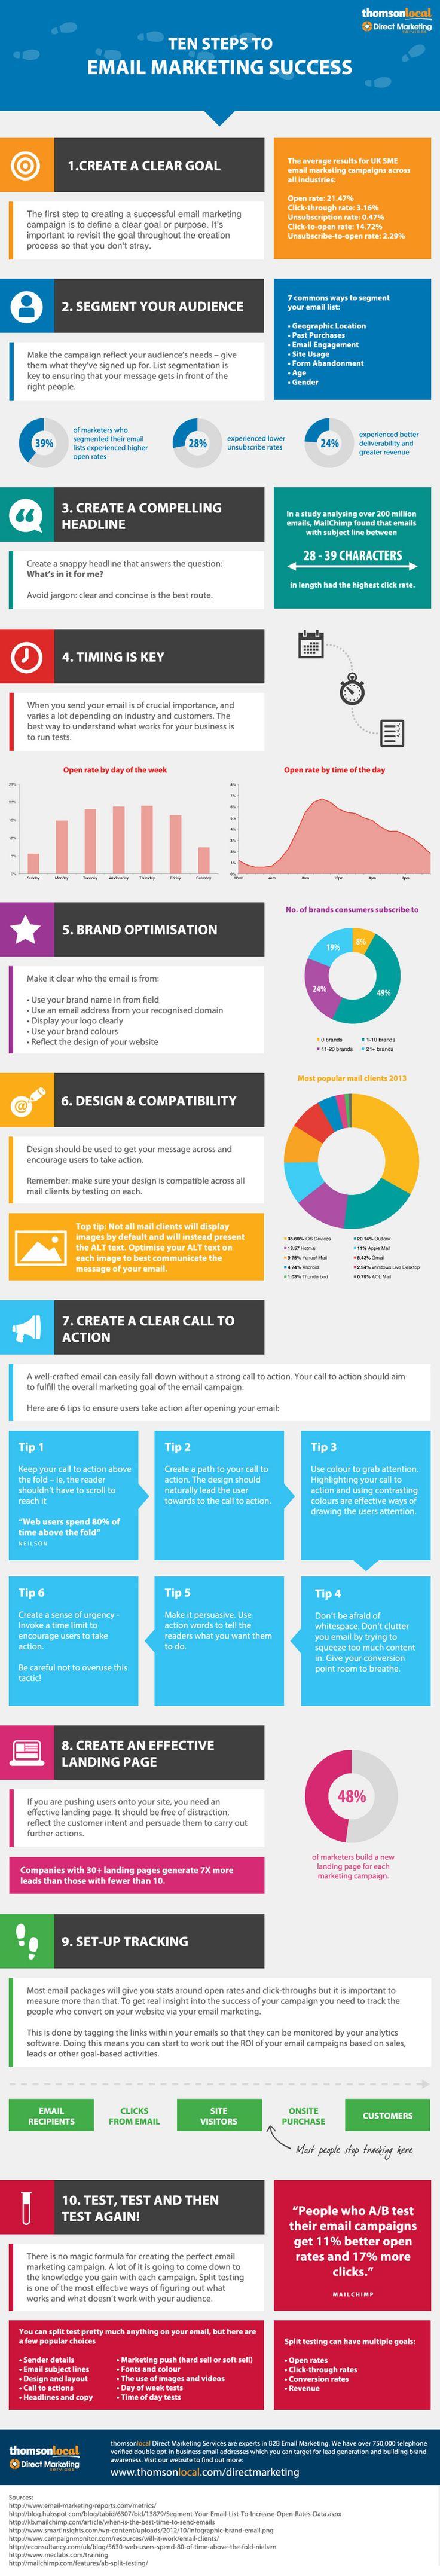 2380 best Online Business Tools images on Pinterest | Internet ...